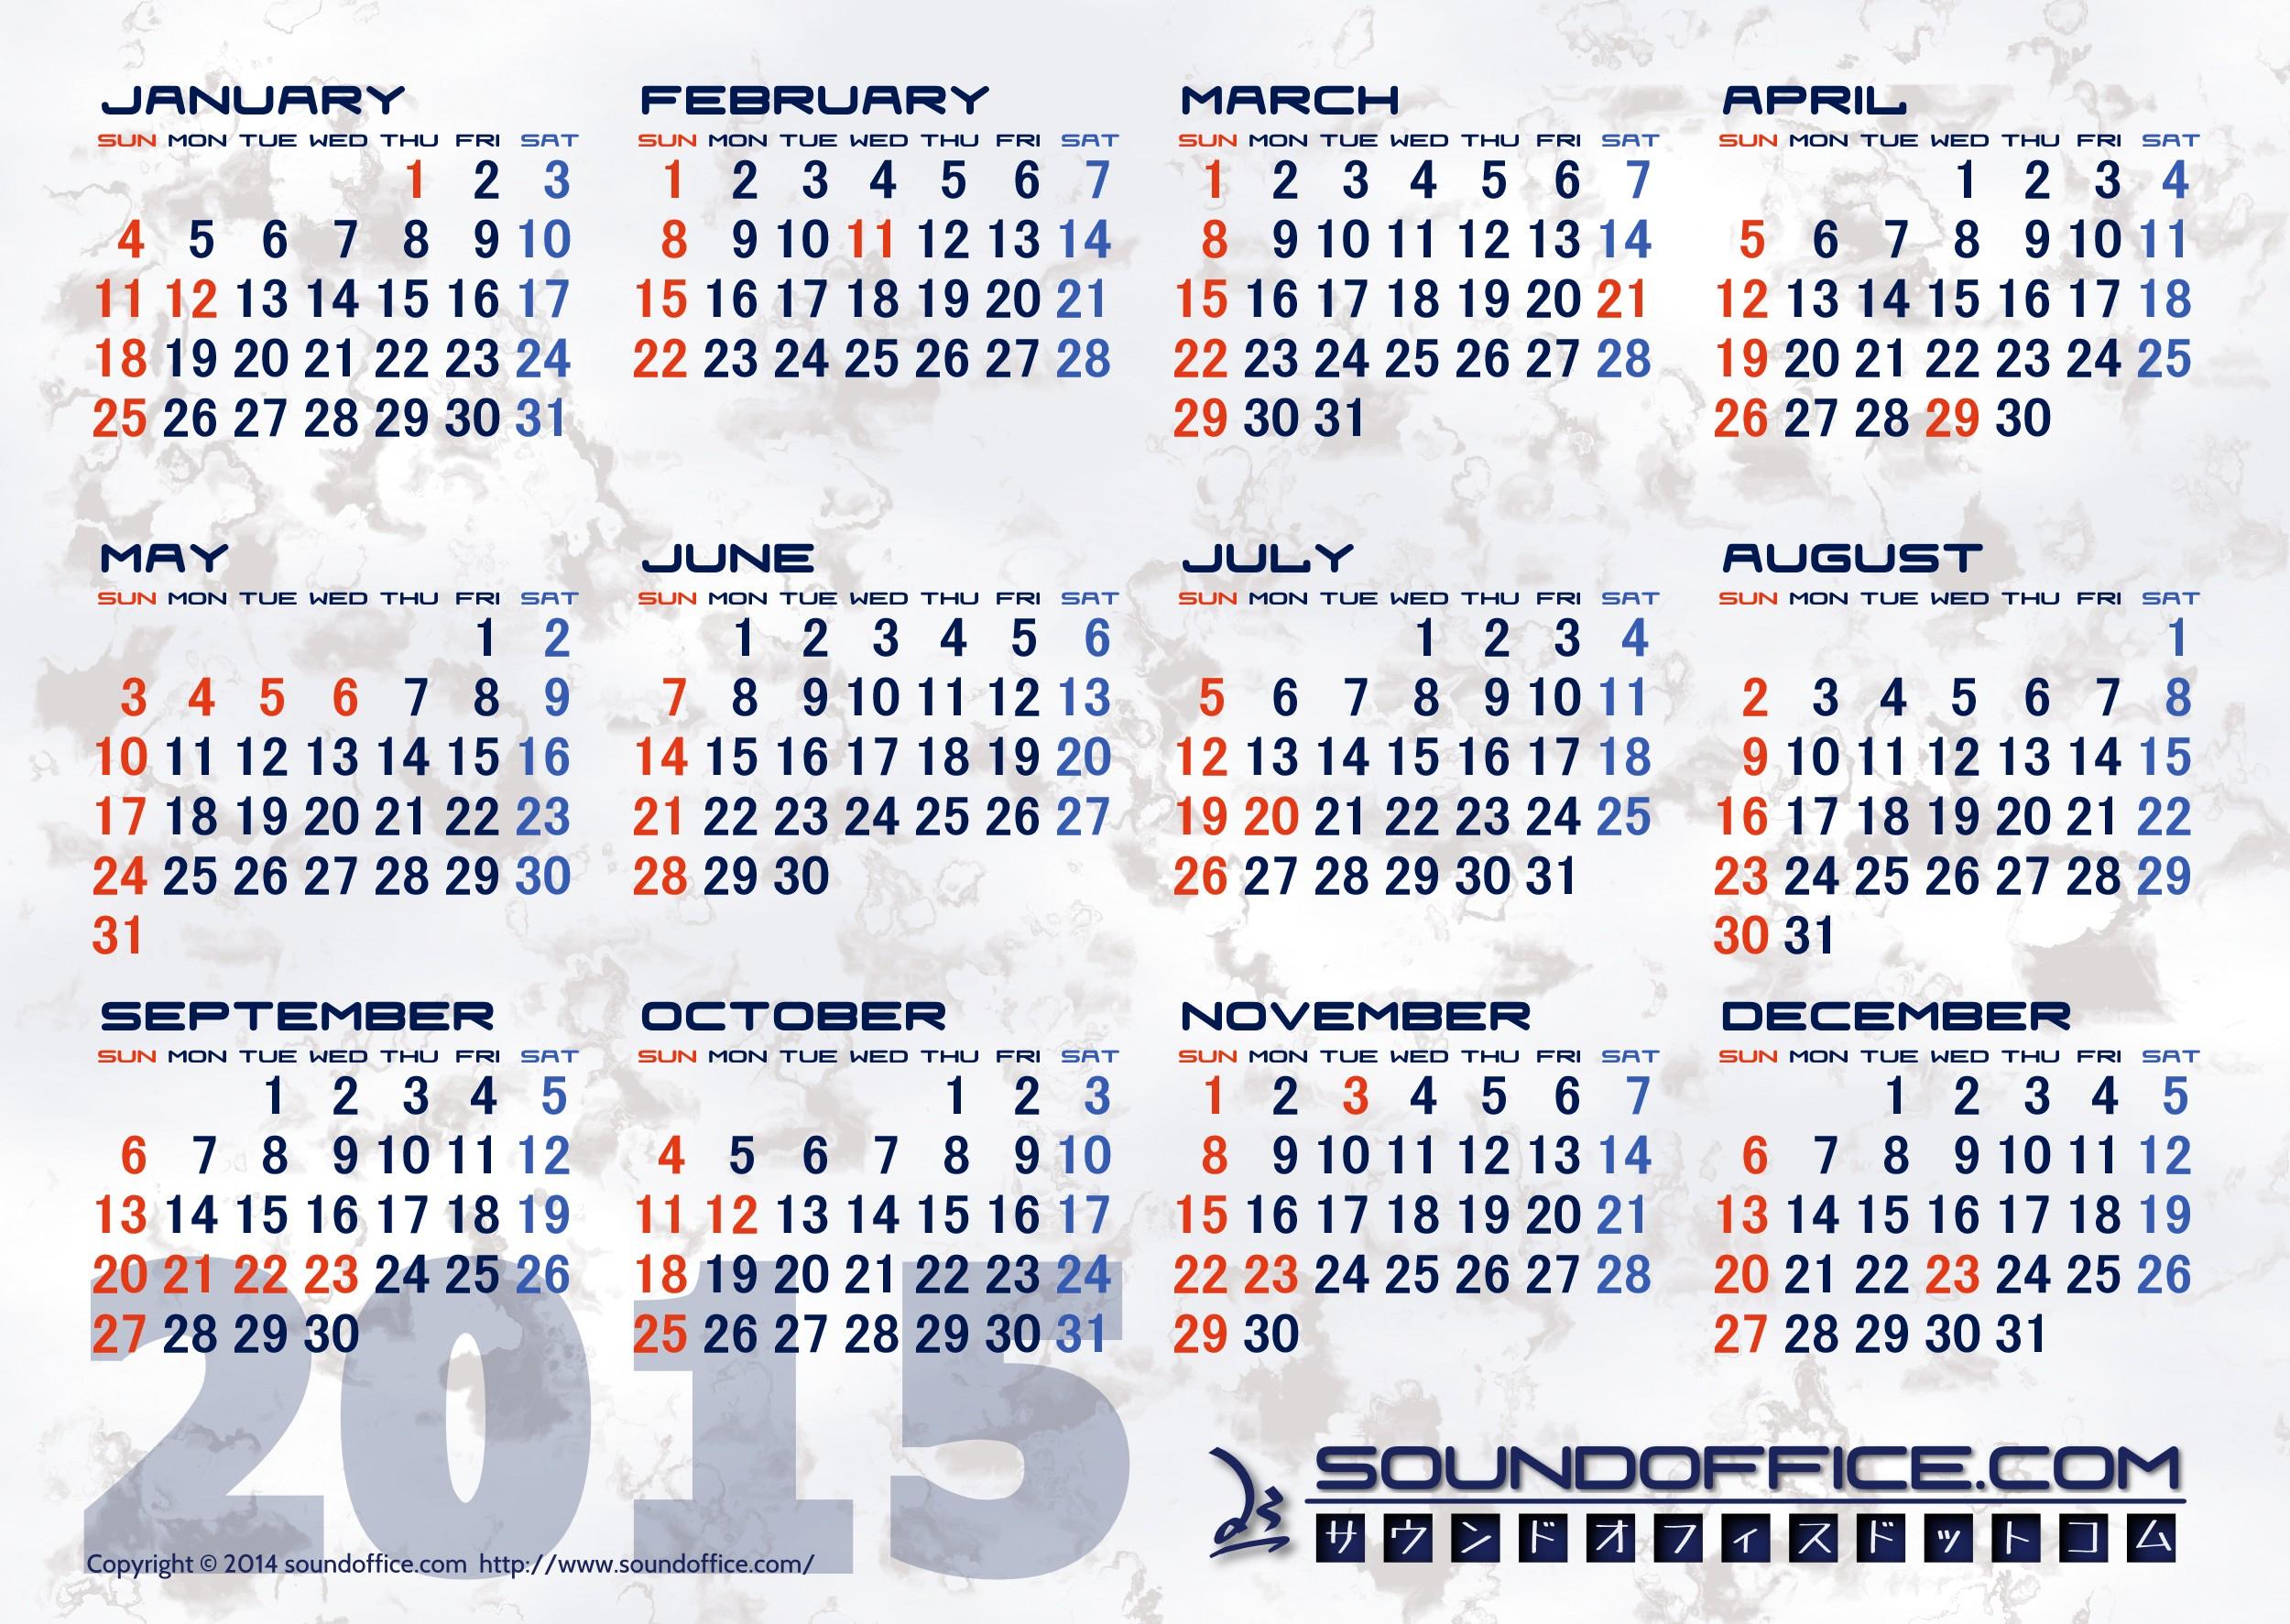 2015-calendar-yearly-2015-12- ... : 2015 カレンダー 卓上 : カレンダー